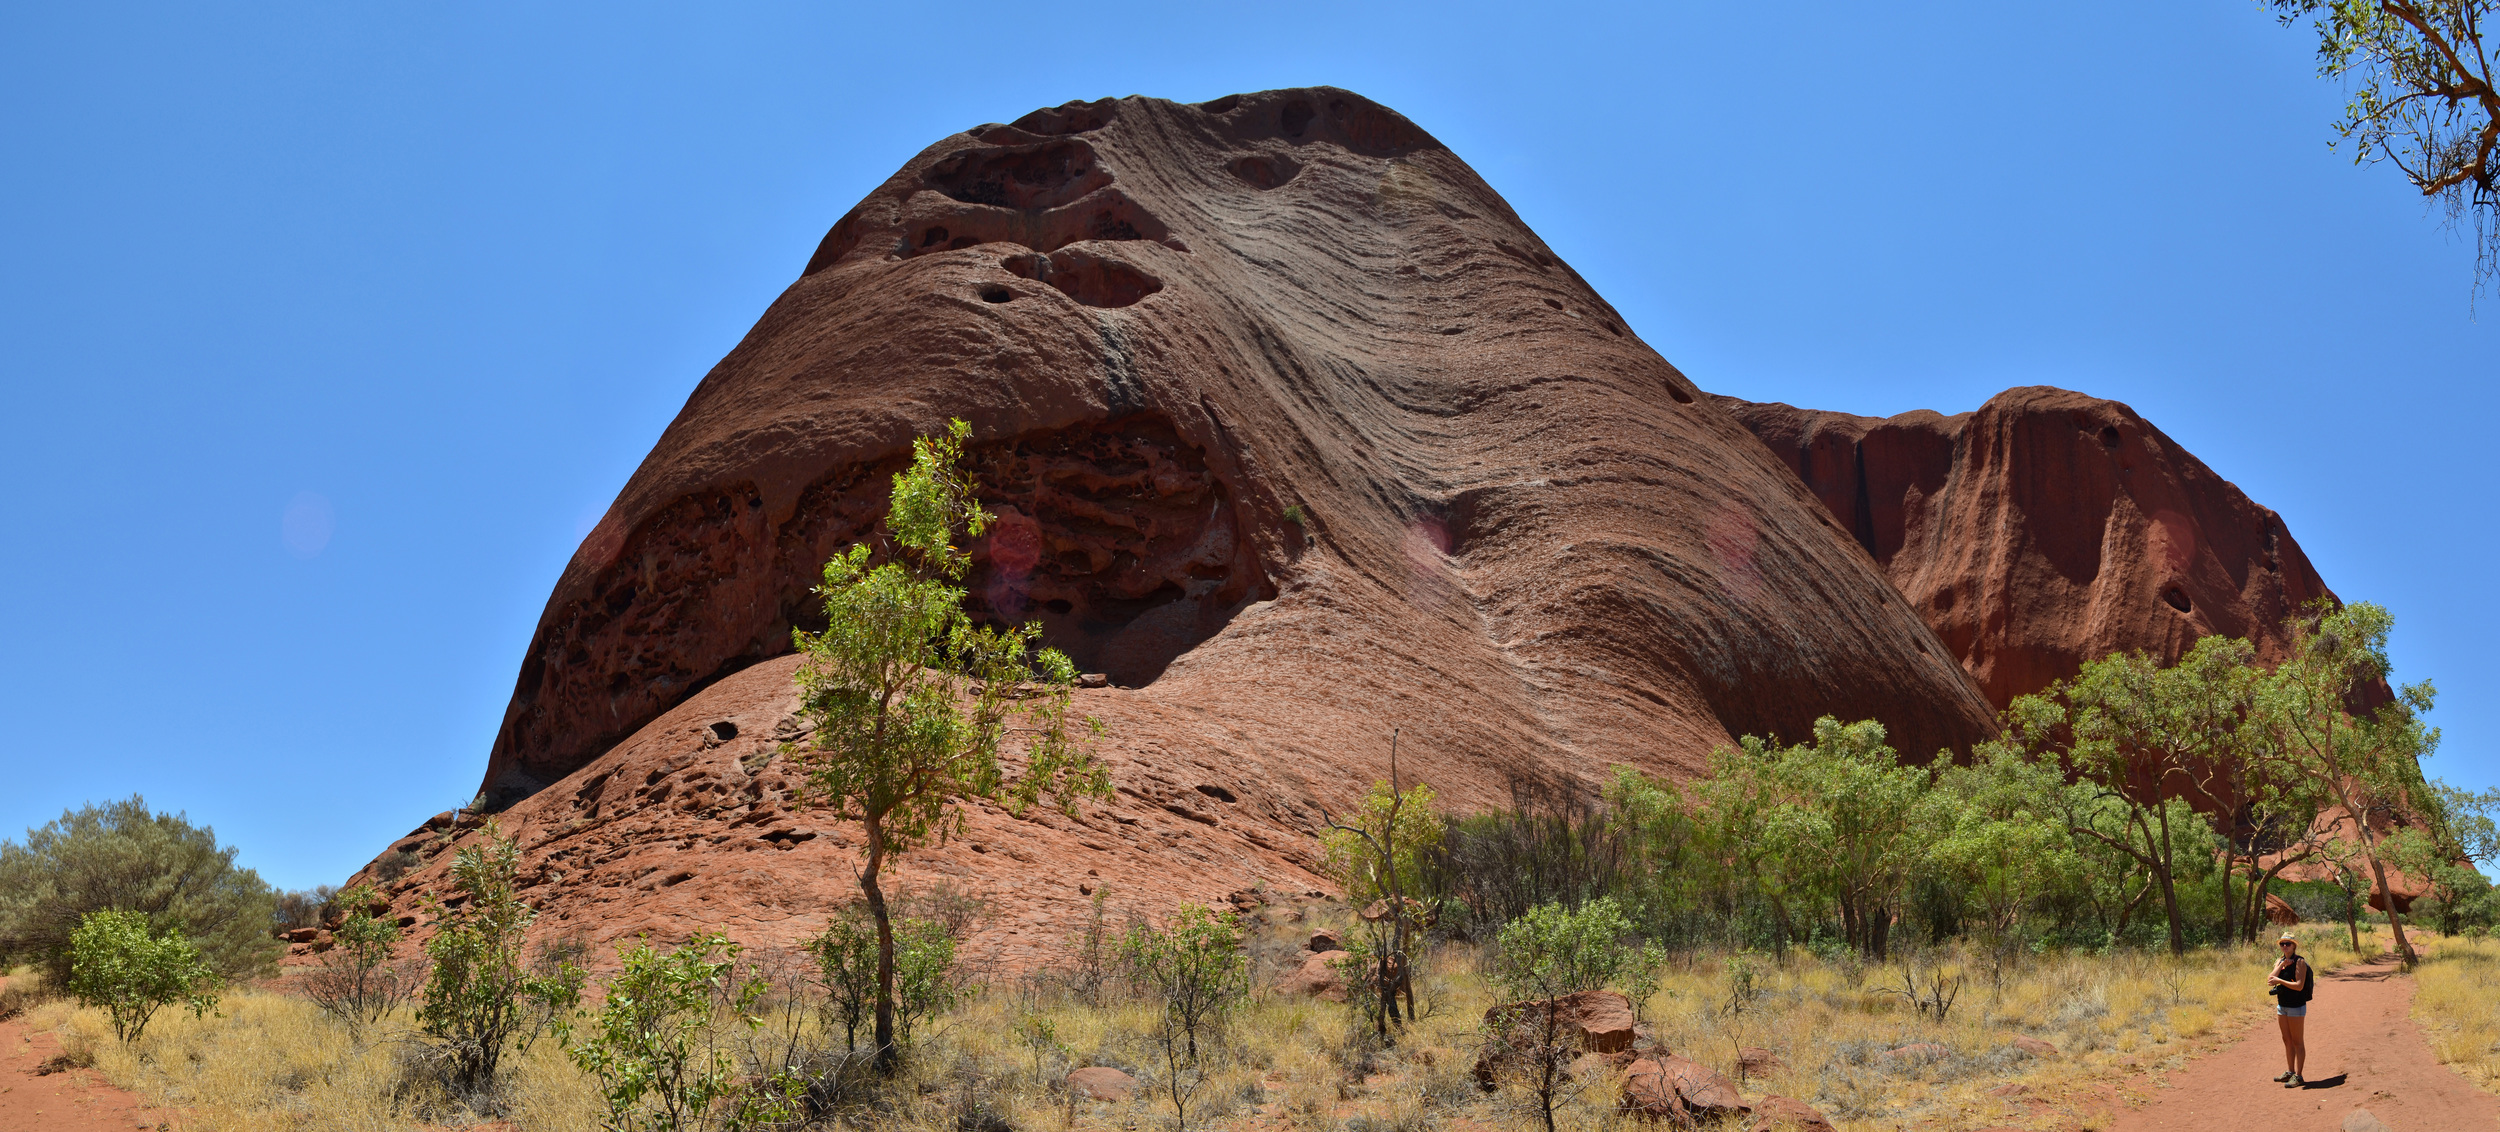 [26] Perspectives, Uluru, Northern Territory.